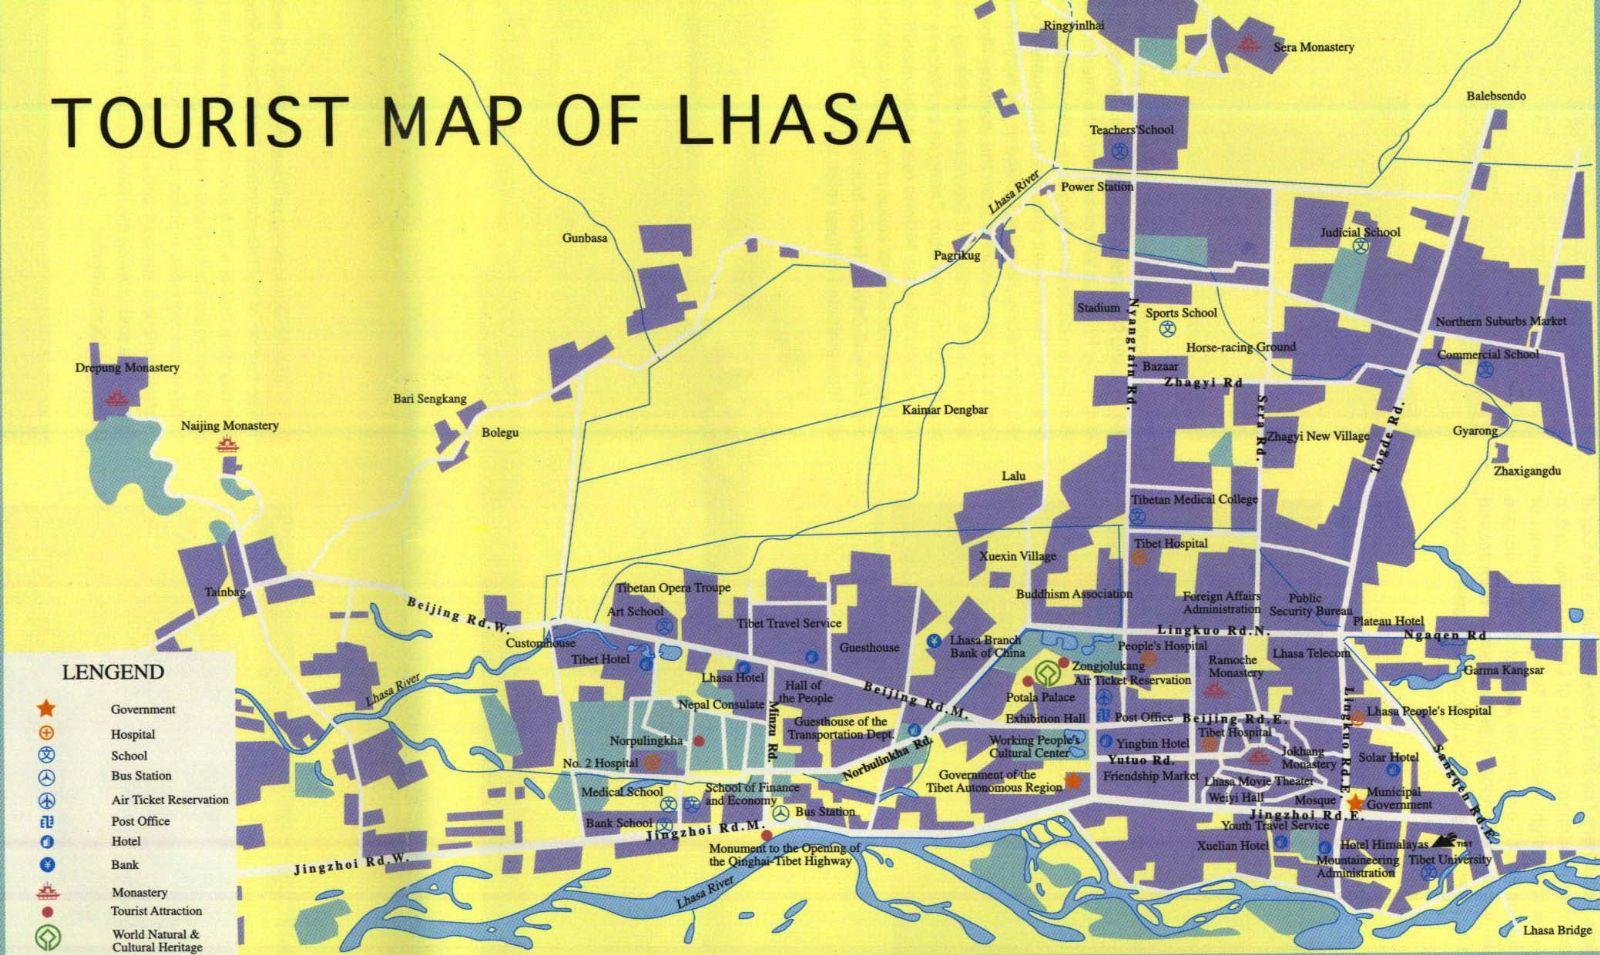 Lhasa Tourist Map